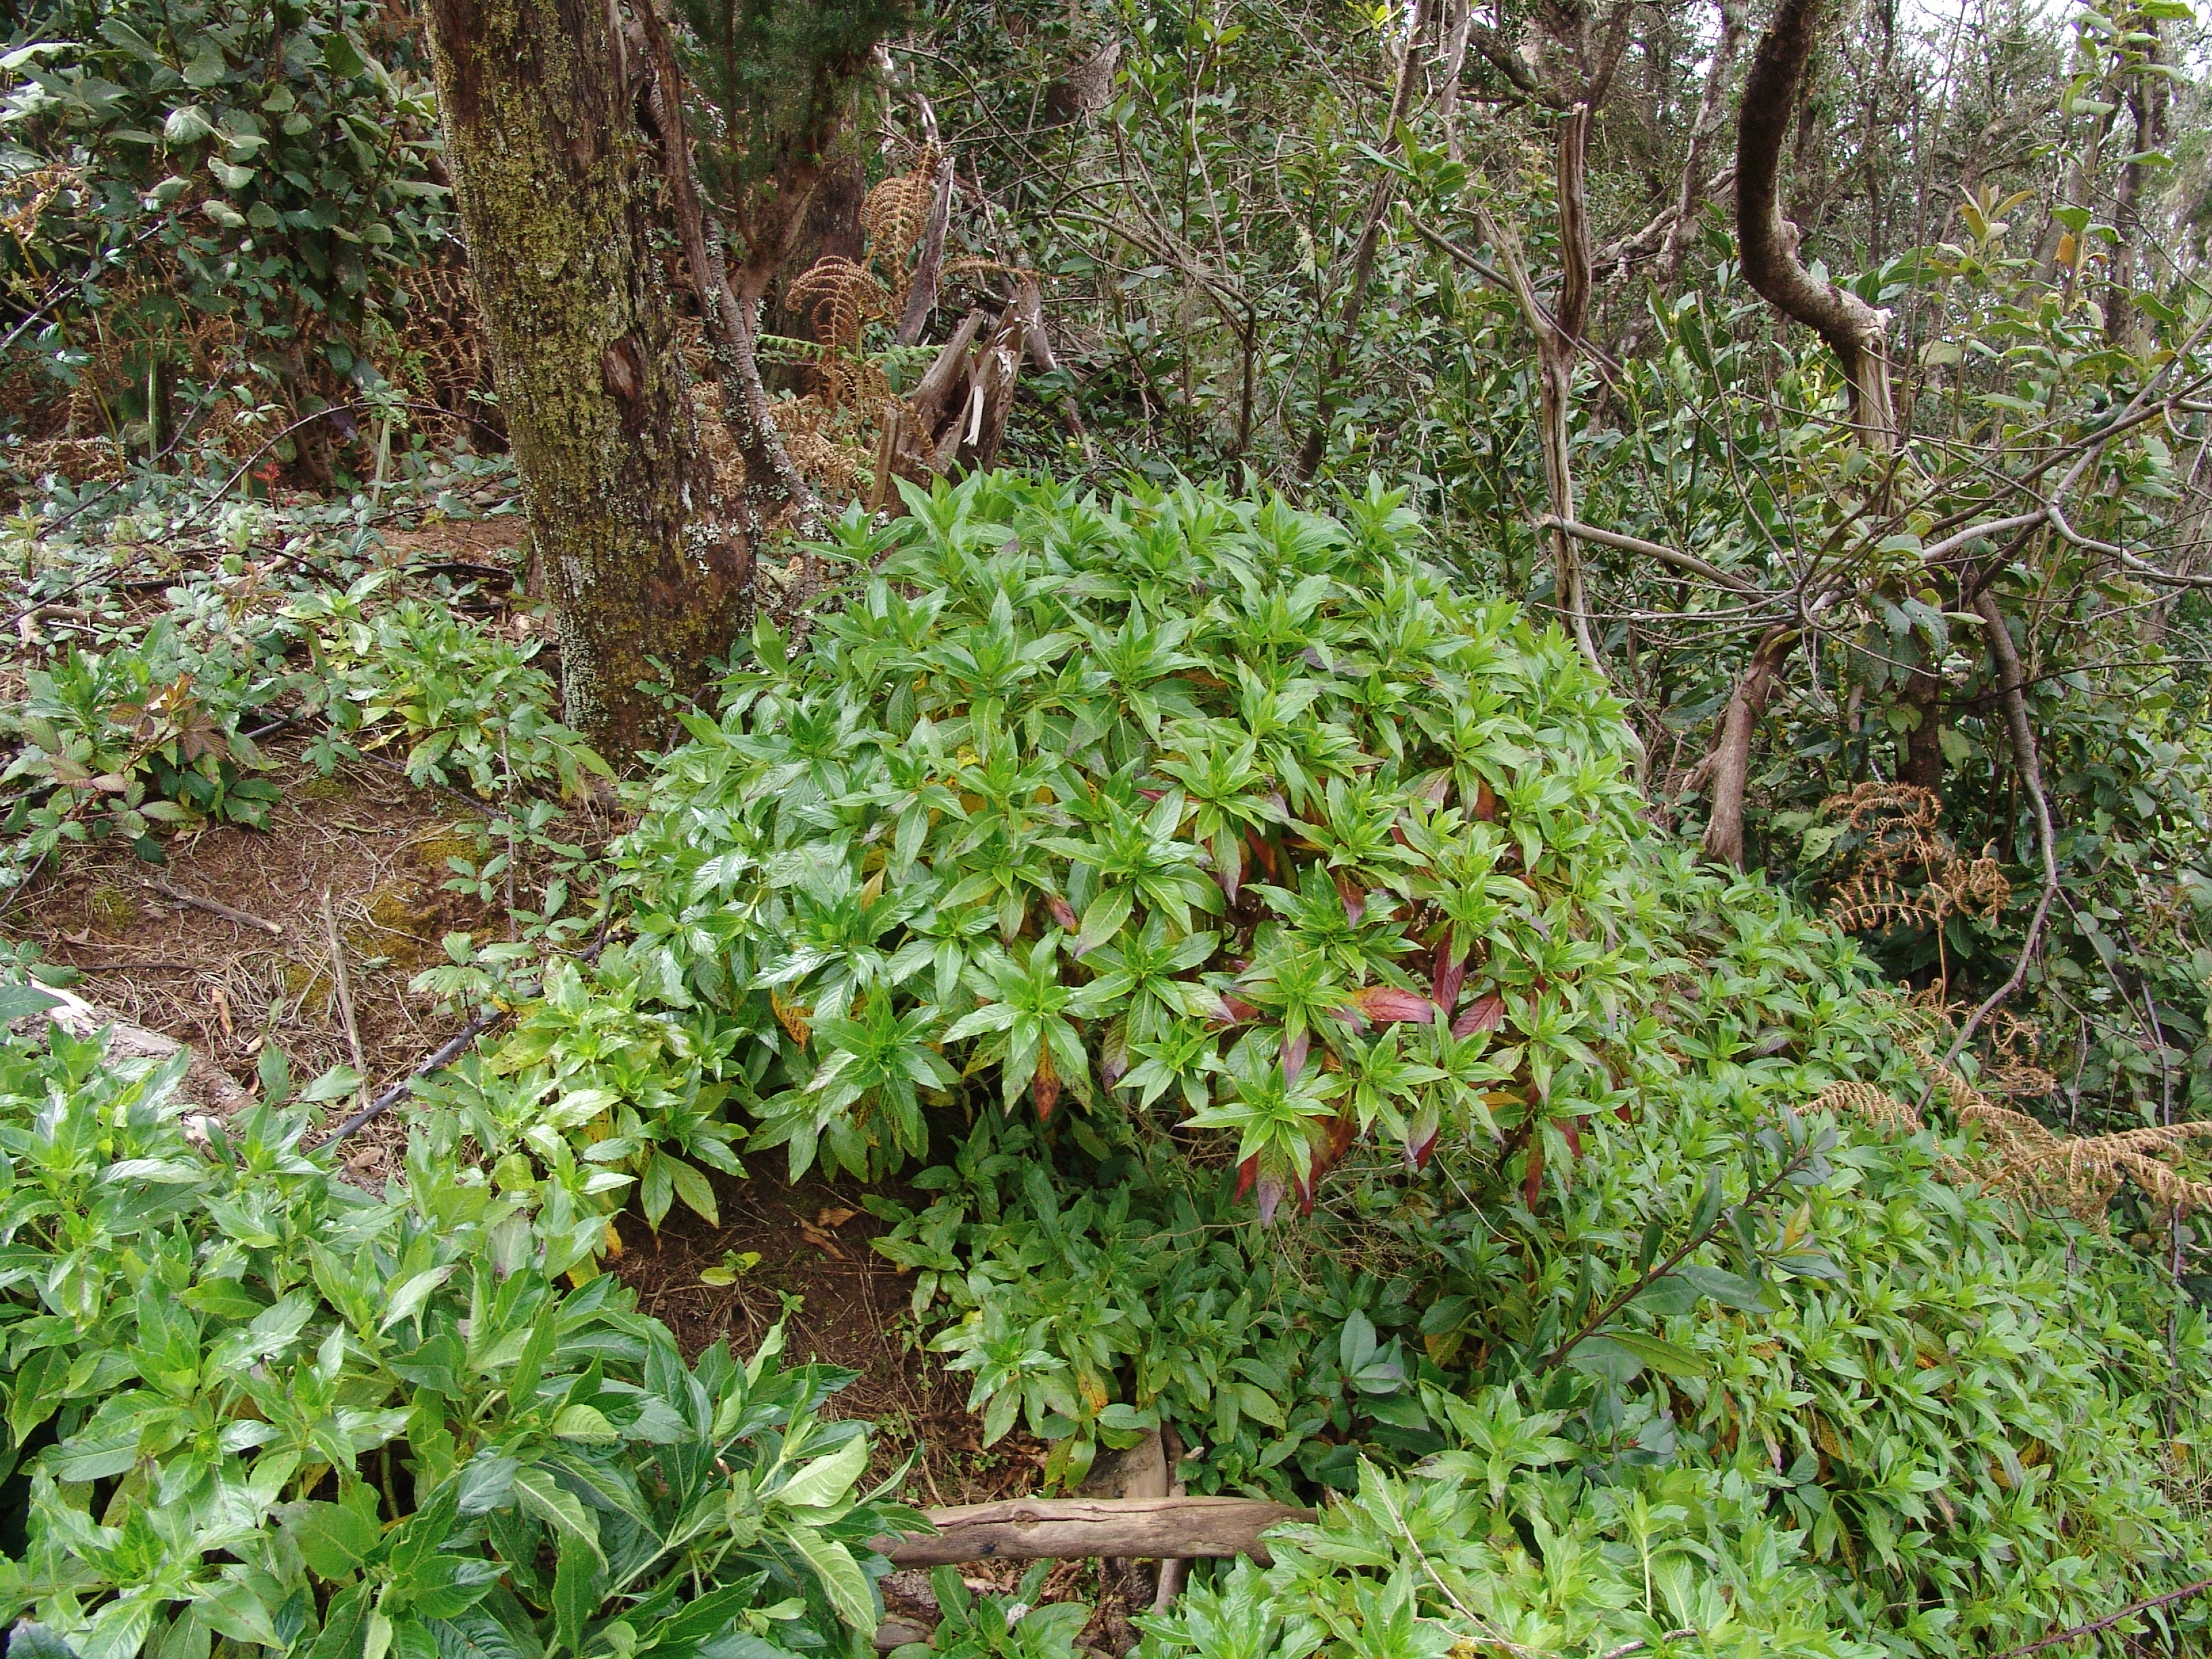 dsc09267-habitat-2-a-10.jpg